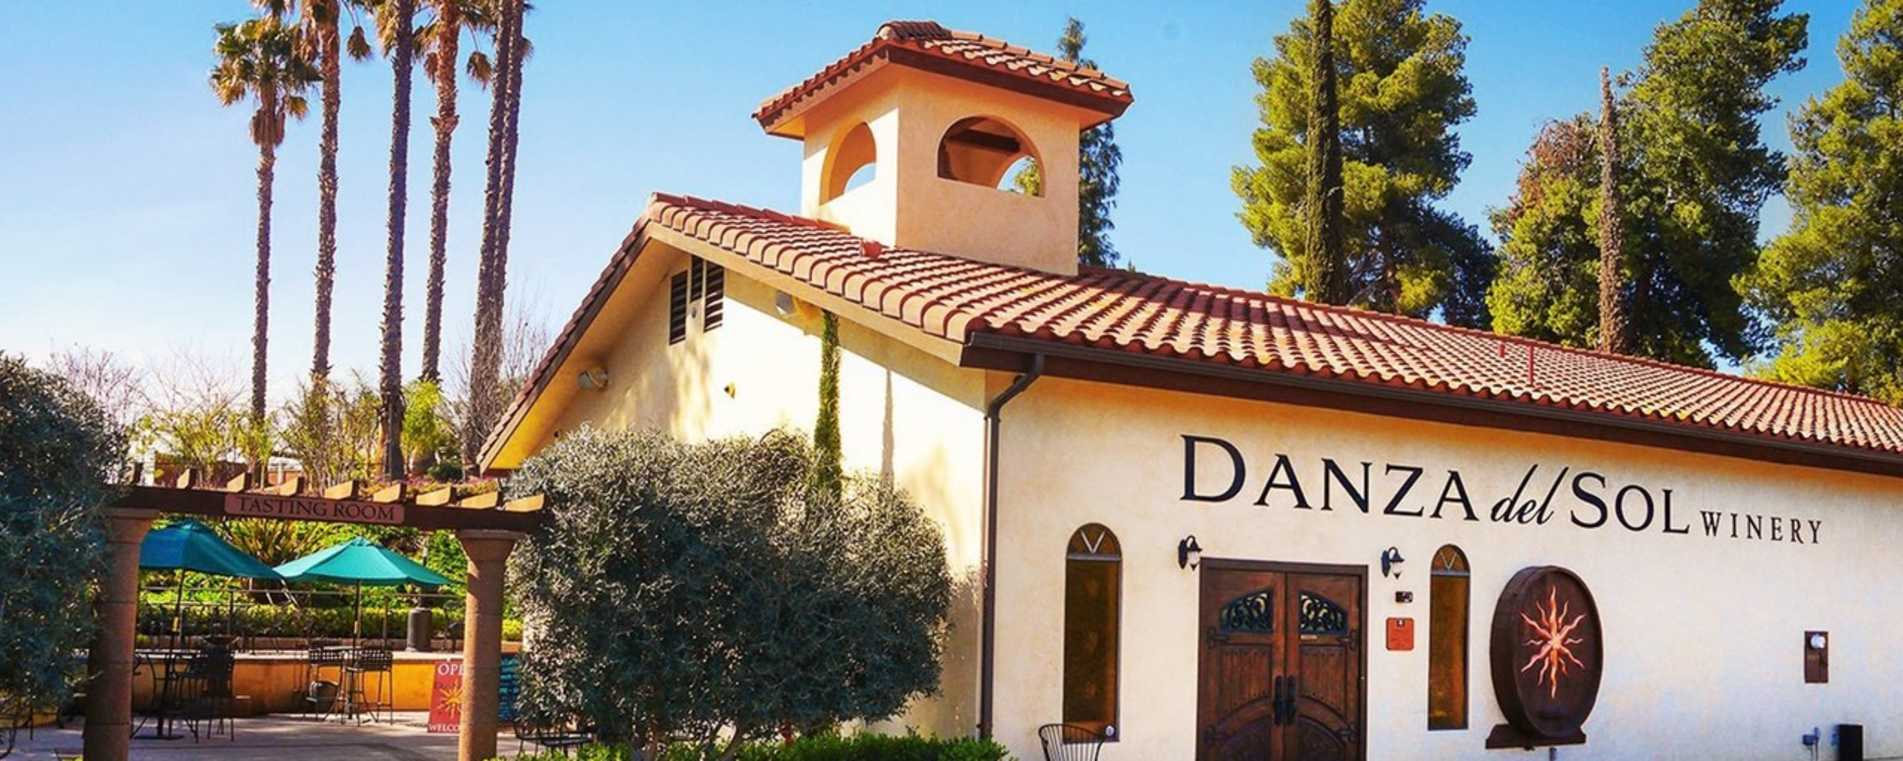 Danza Del Sol Winery - Temecula